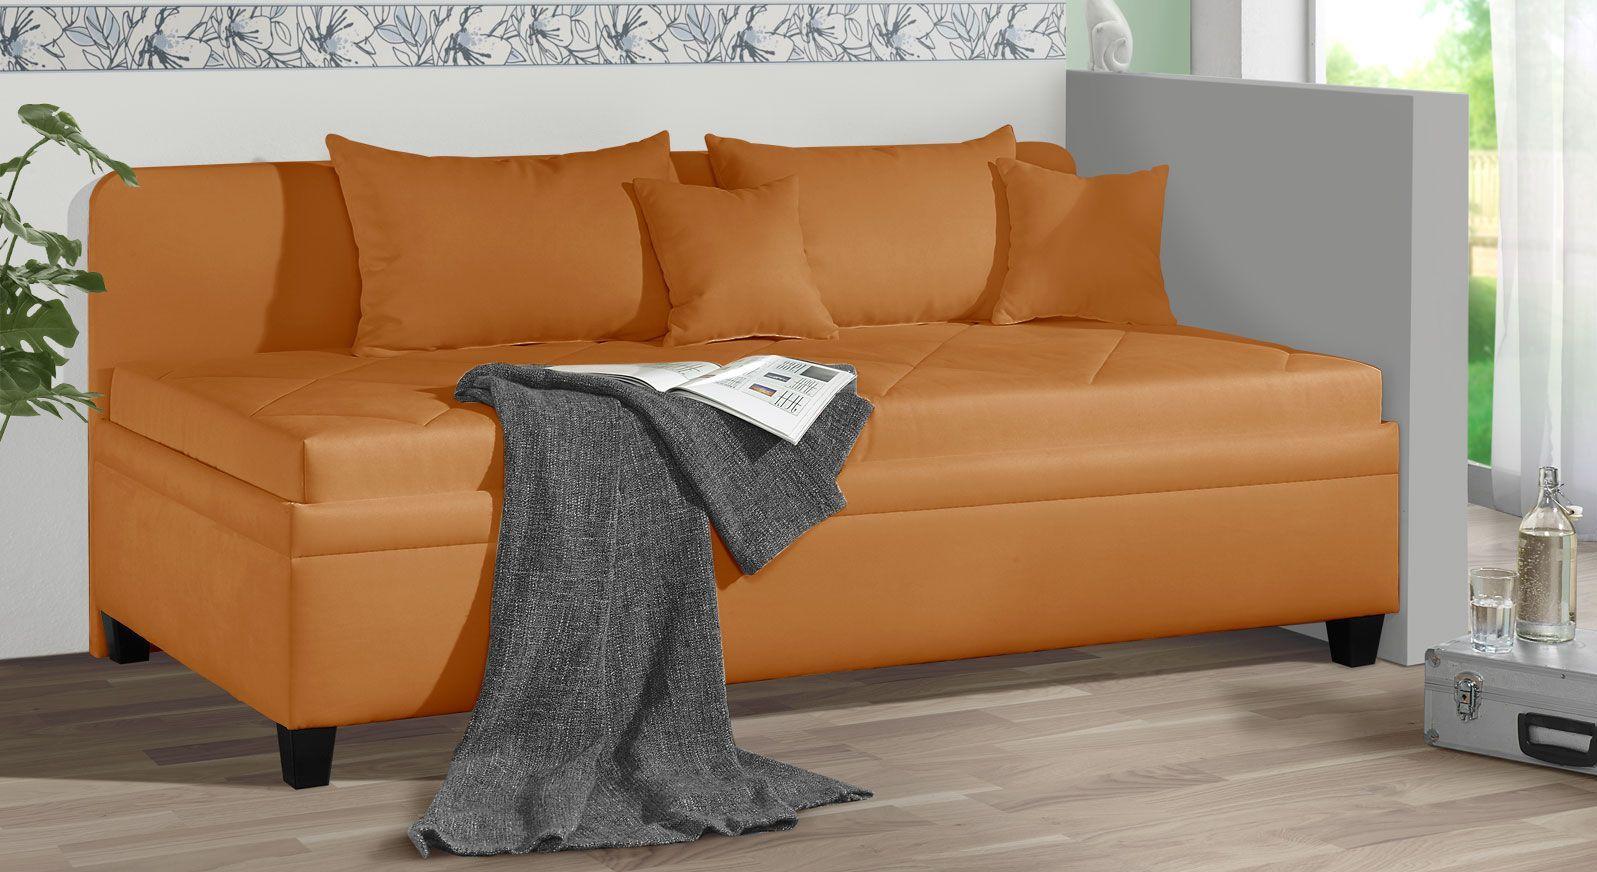 Sofaliege Kamina aus Microvelours in Orange